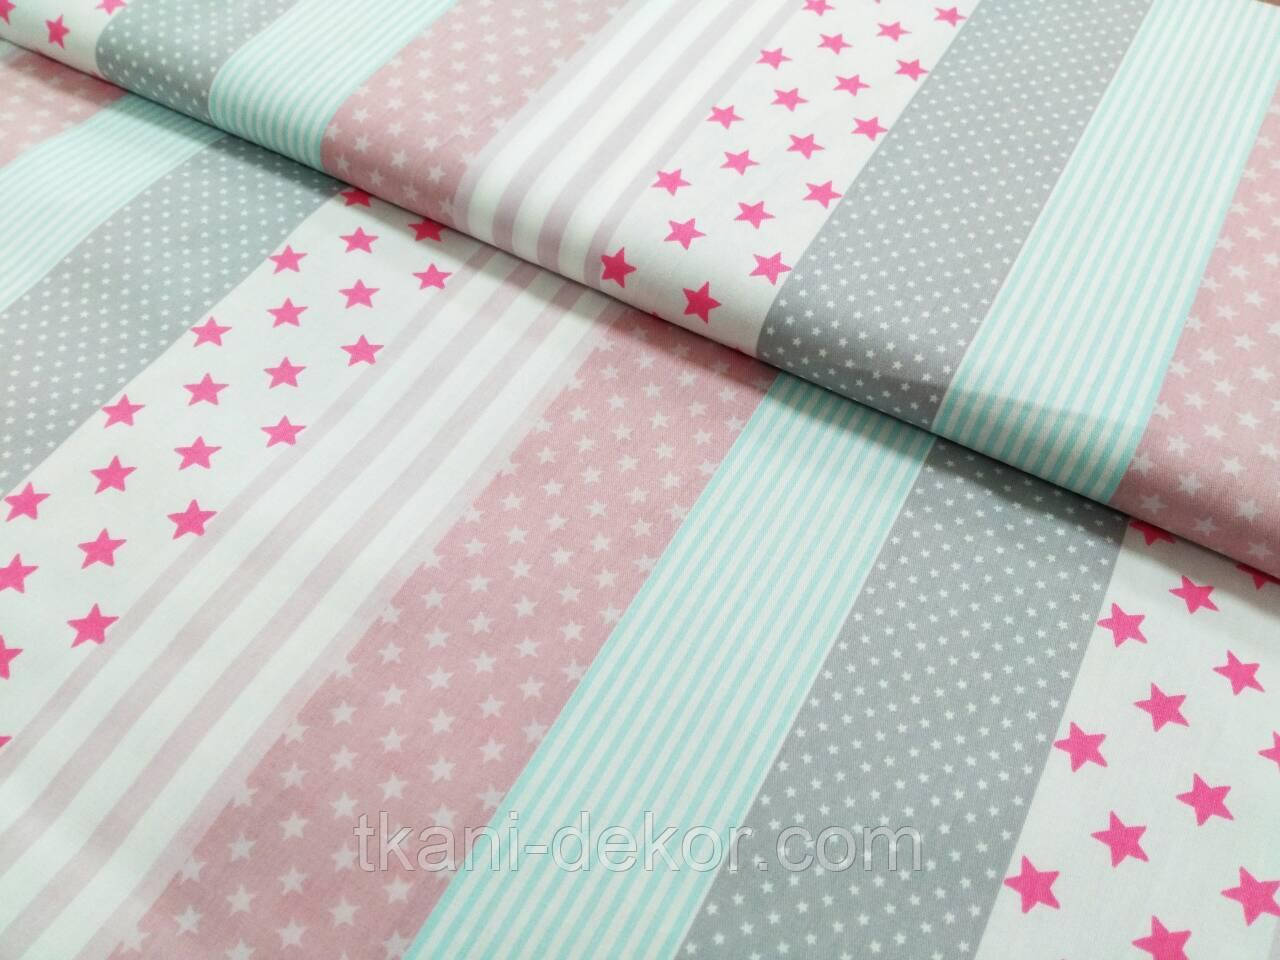 Сатин (хлопковая ткань) на цветных полосках звезды